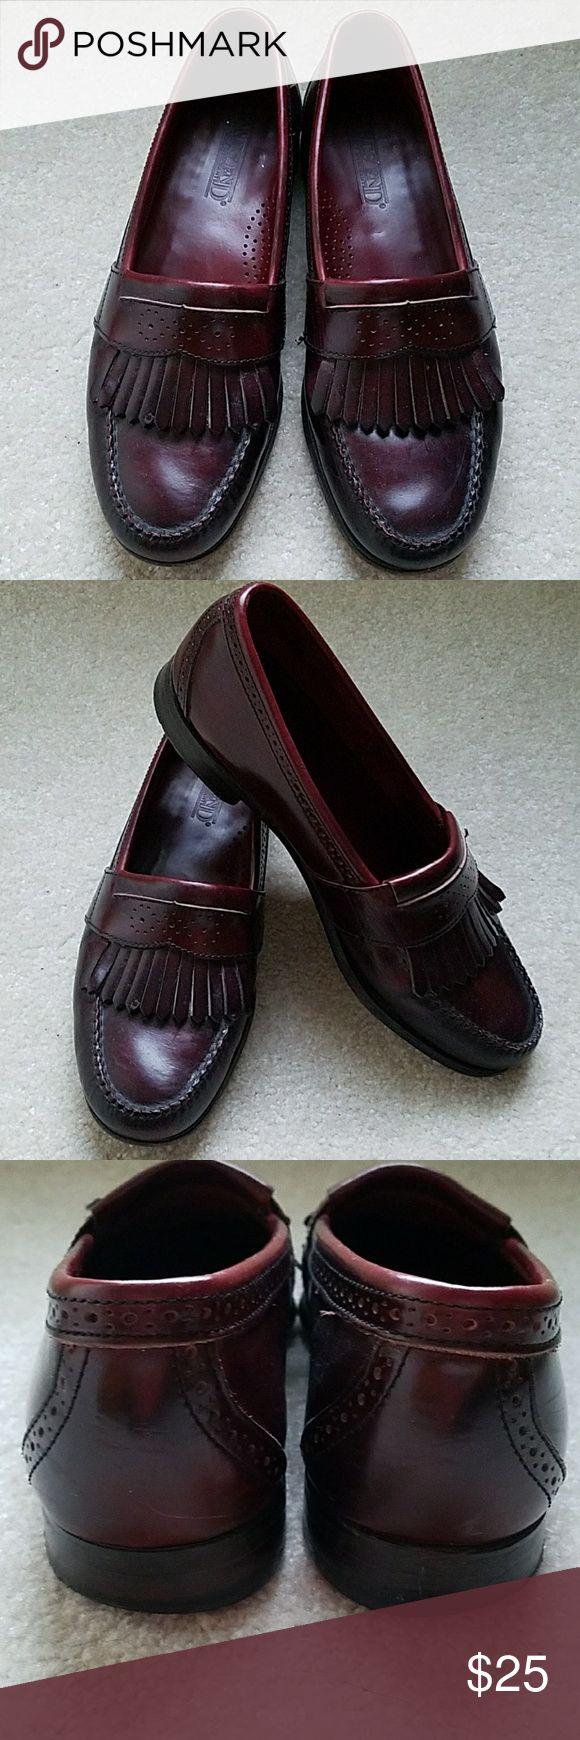 Lands End Men's Loafers Pre owned Lands' End Kilted Slip on Loafers. Mahogany Lands' End Shoes Loafers & Slip-Ons